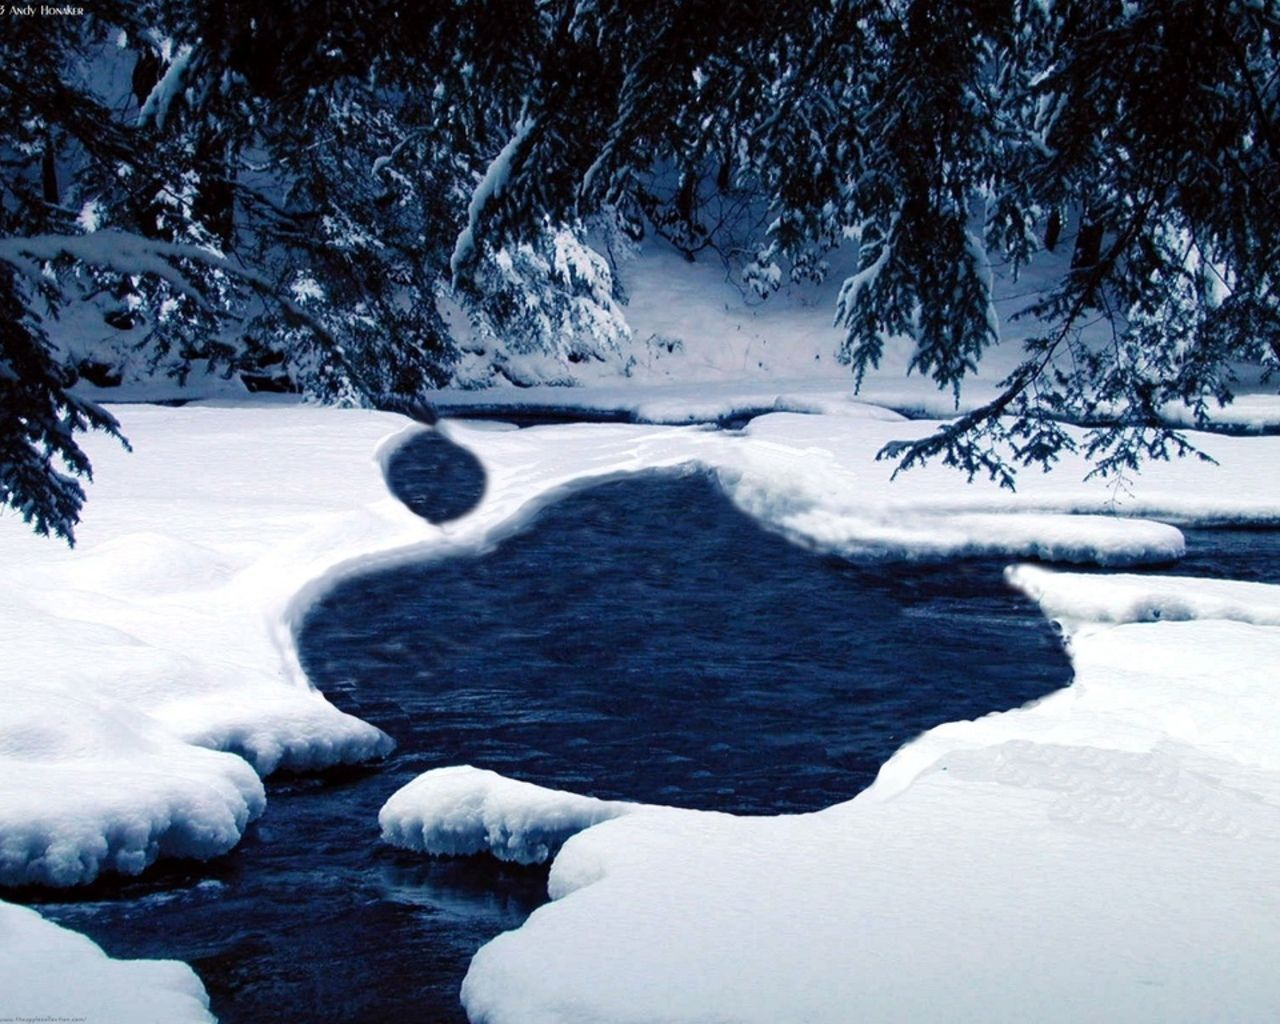 Most Inspiring Wallpaper Mac Winter - edbaa47b172afafd711c577097aac429  Pic_92364.jpg